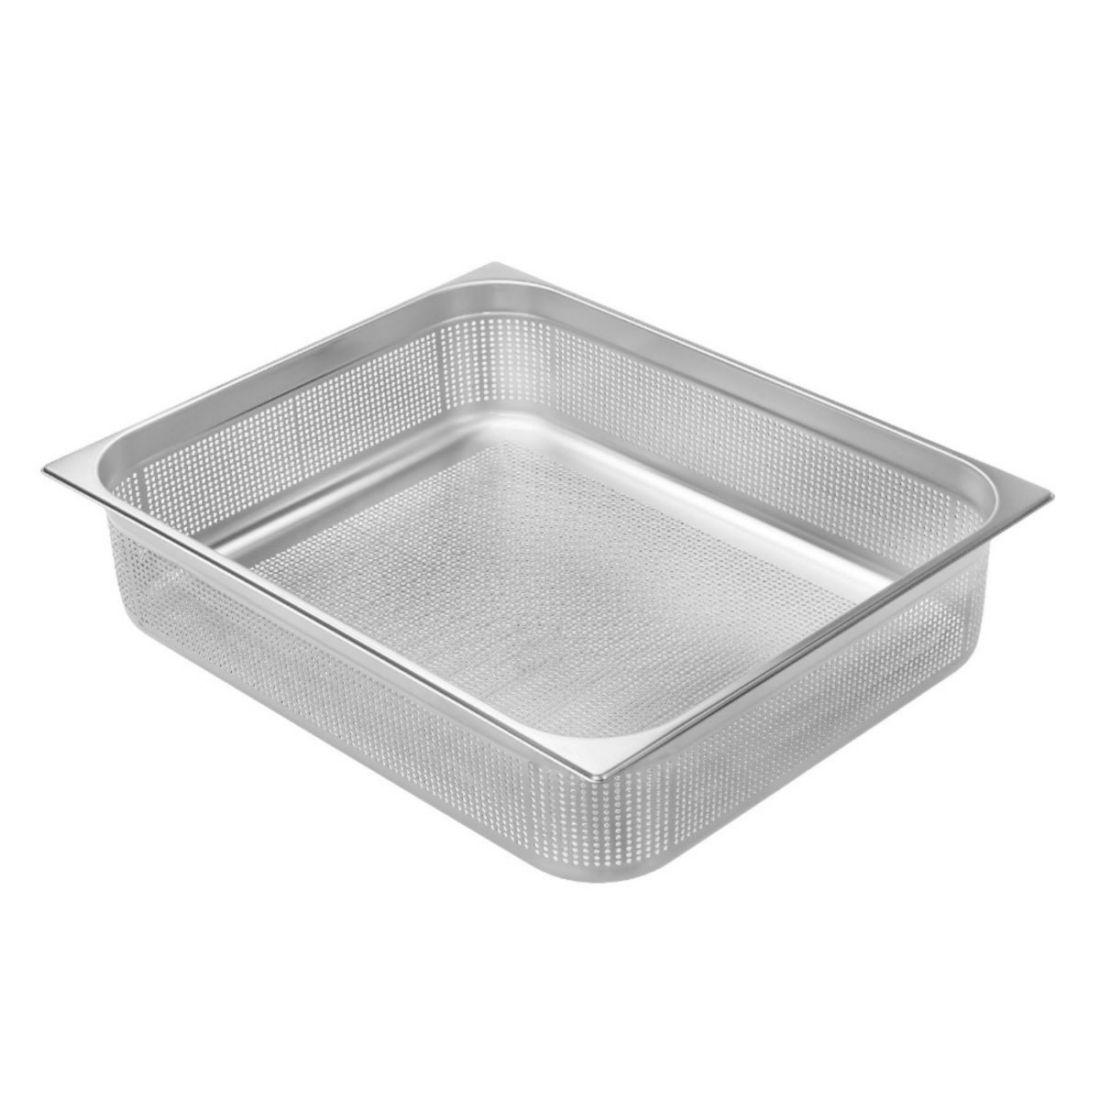 Gastronádoba Profi děrovaná GN 2/1 065 mm